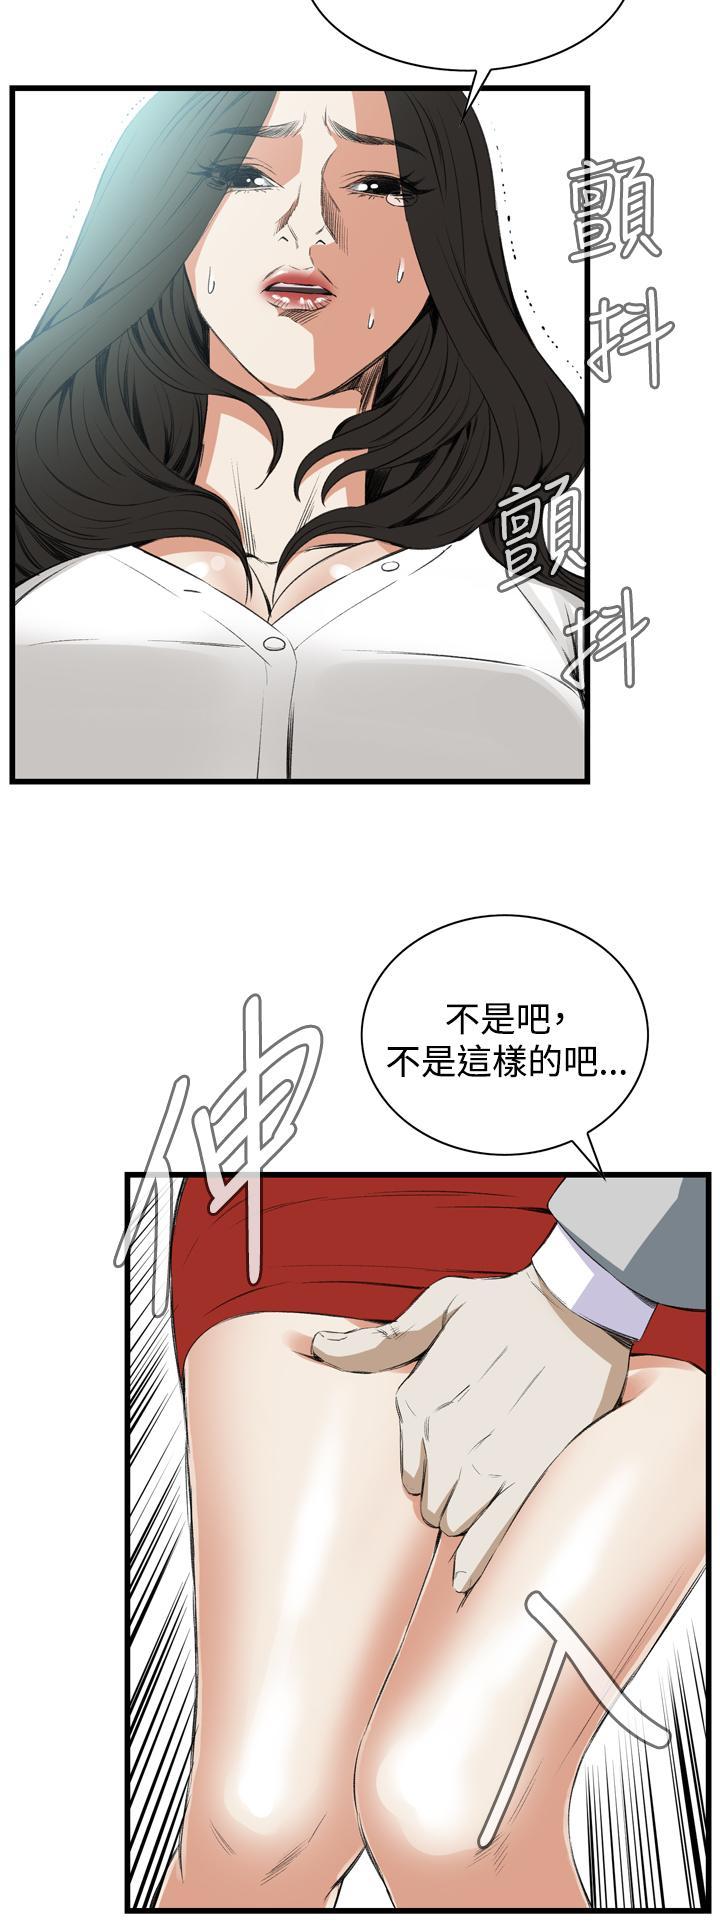 Take a Peek 偷窥 Ch.39~55 [Chinese]中文 308